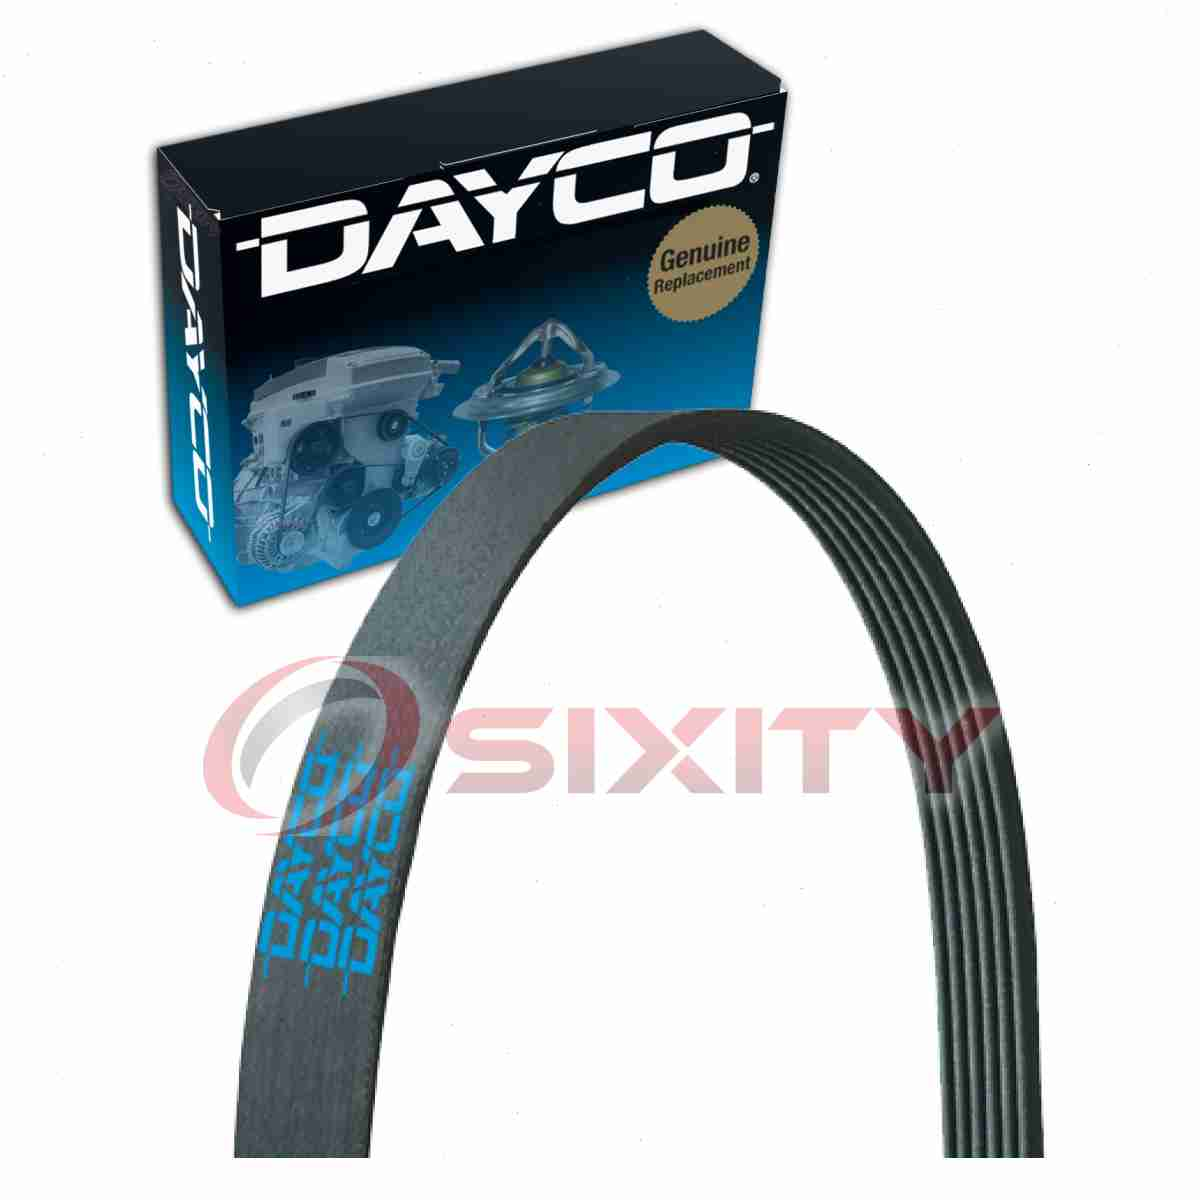 detalles acerca de dayco correa serpentina para 1993-1994 jeep grand  cherokee 5 2l v8-v cinturón ke- mostrar título original